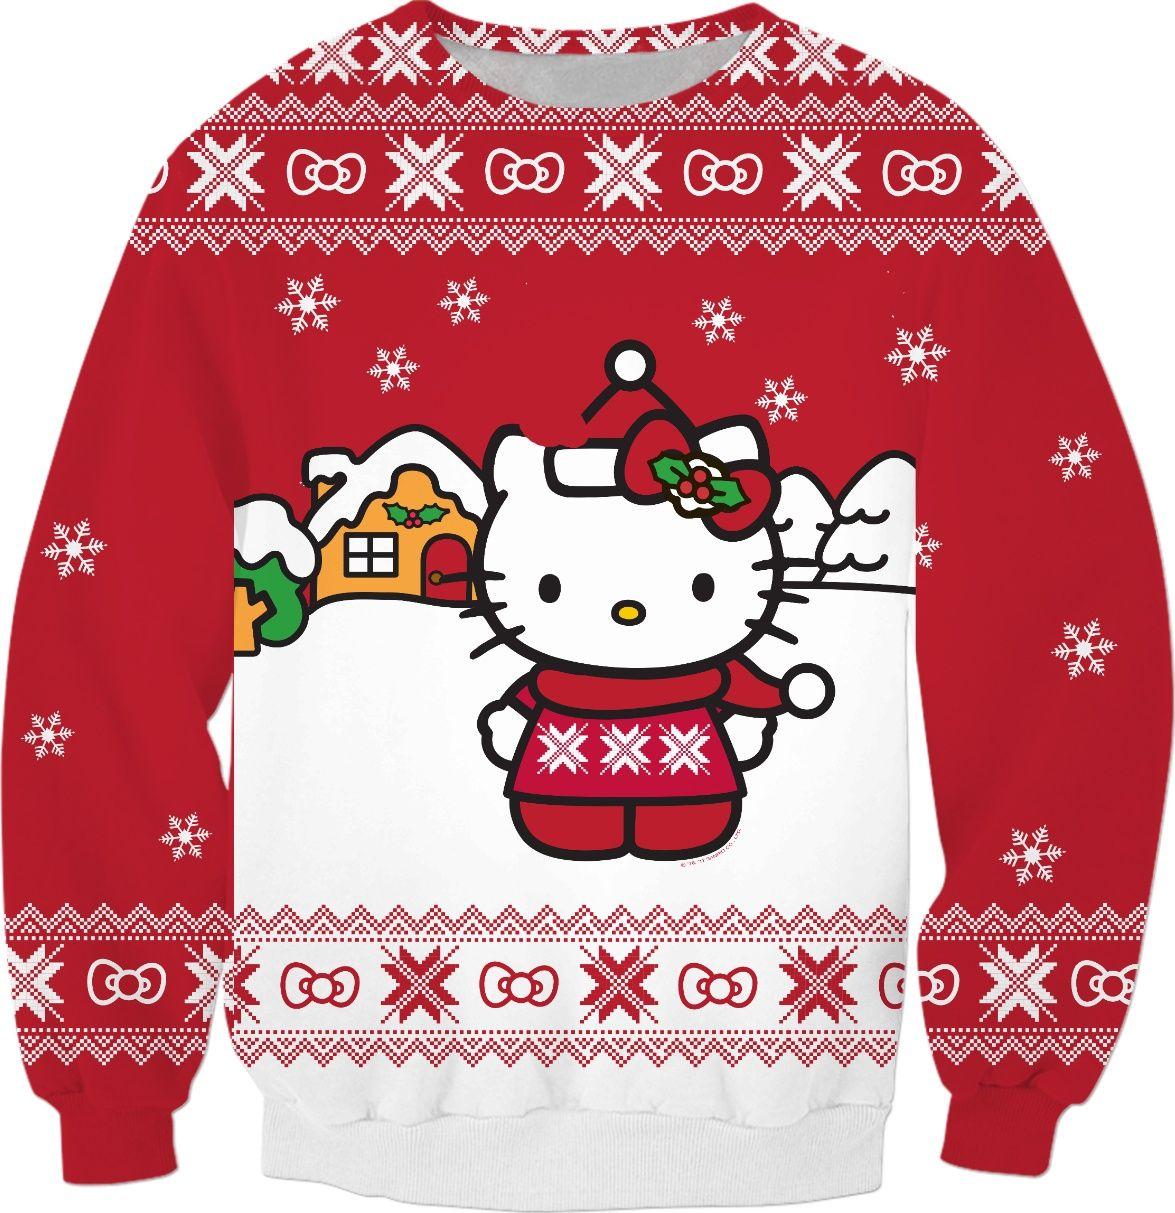 Ugly Christmas Sweater Cartoon.Pin On Hello Kitty